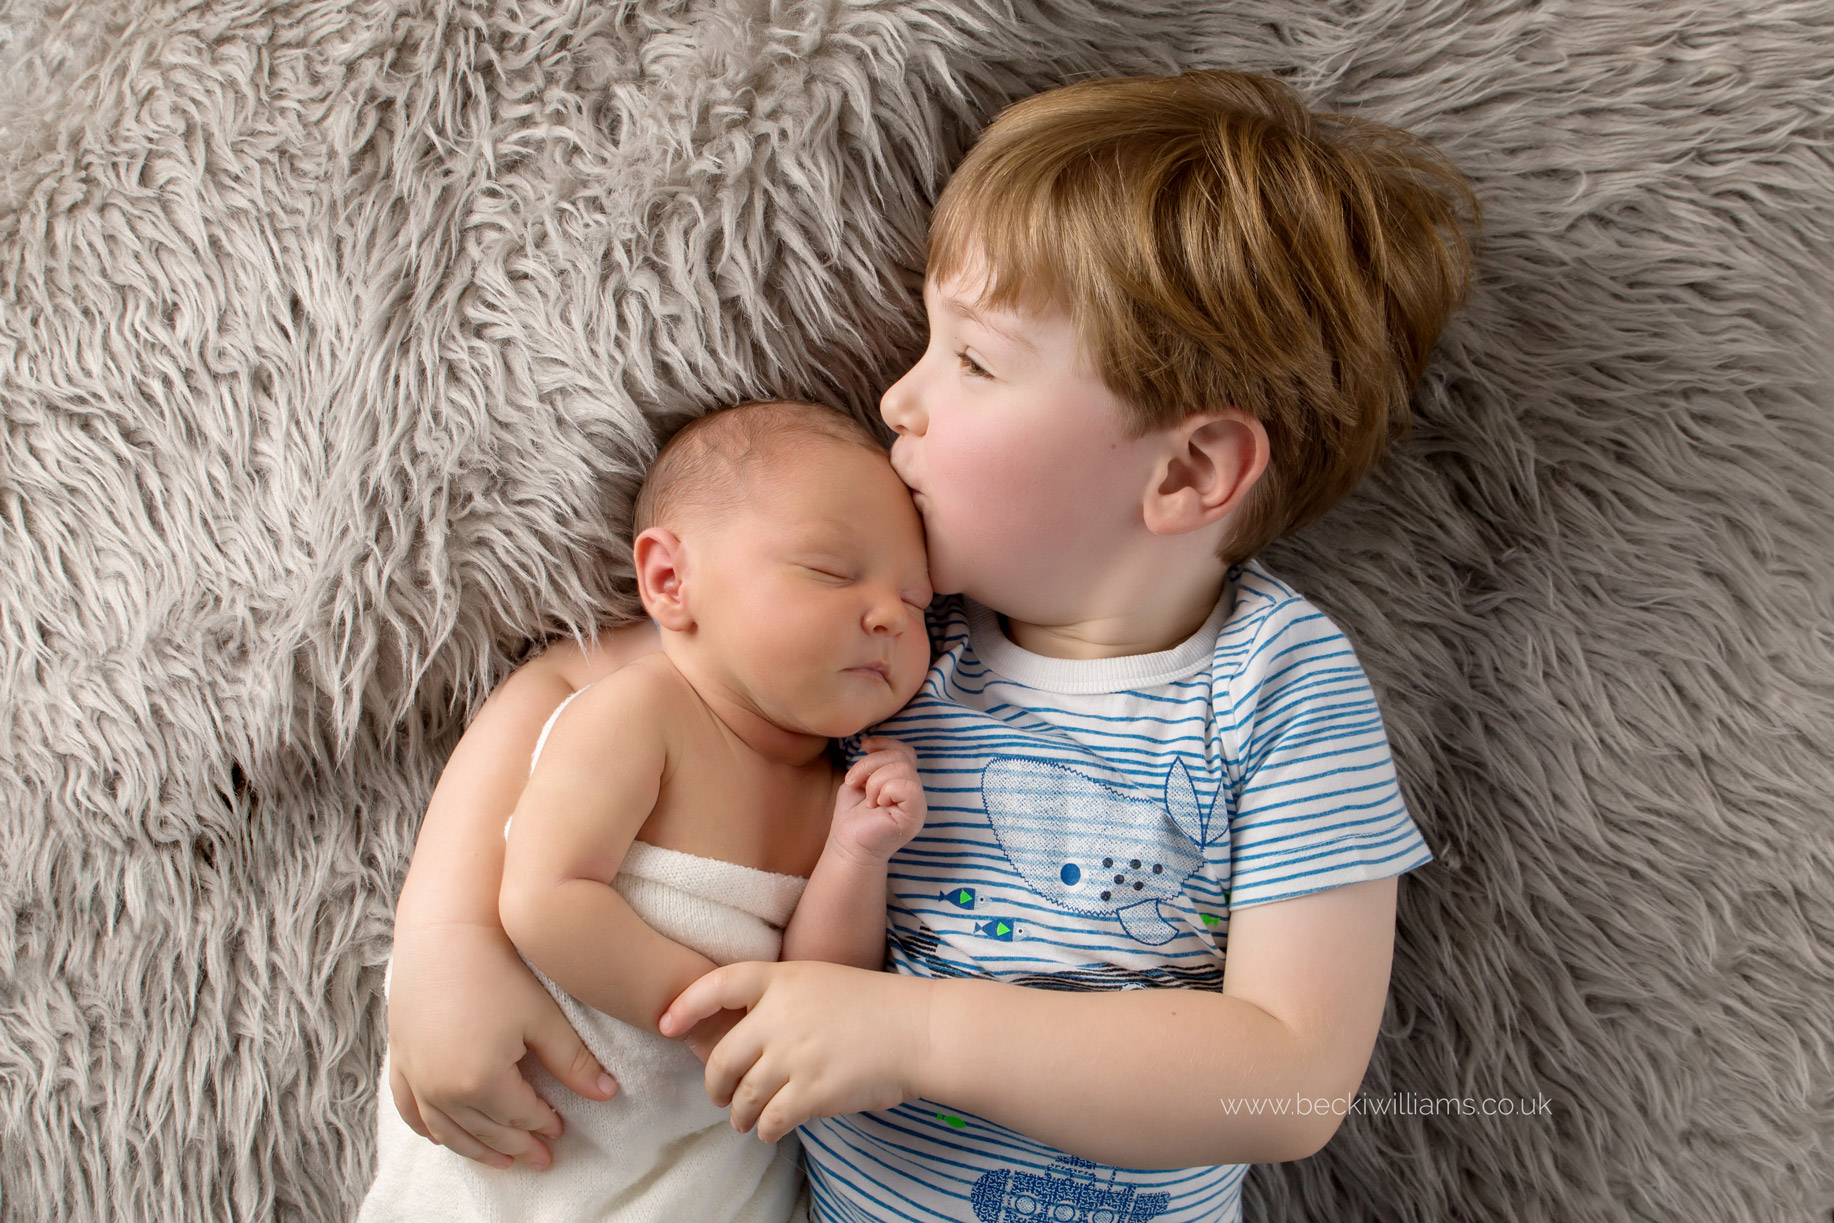 newborn-photographer-in-hertfordshire-boy-cute-asleep-sibling.jpg